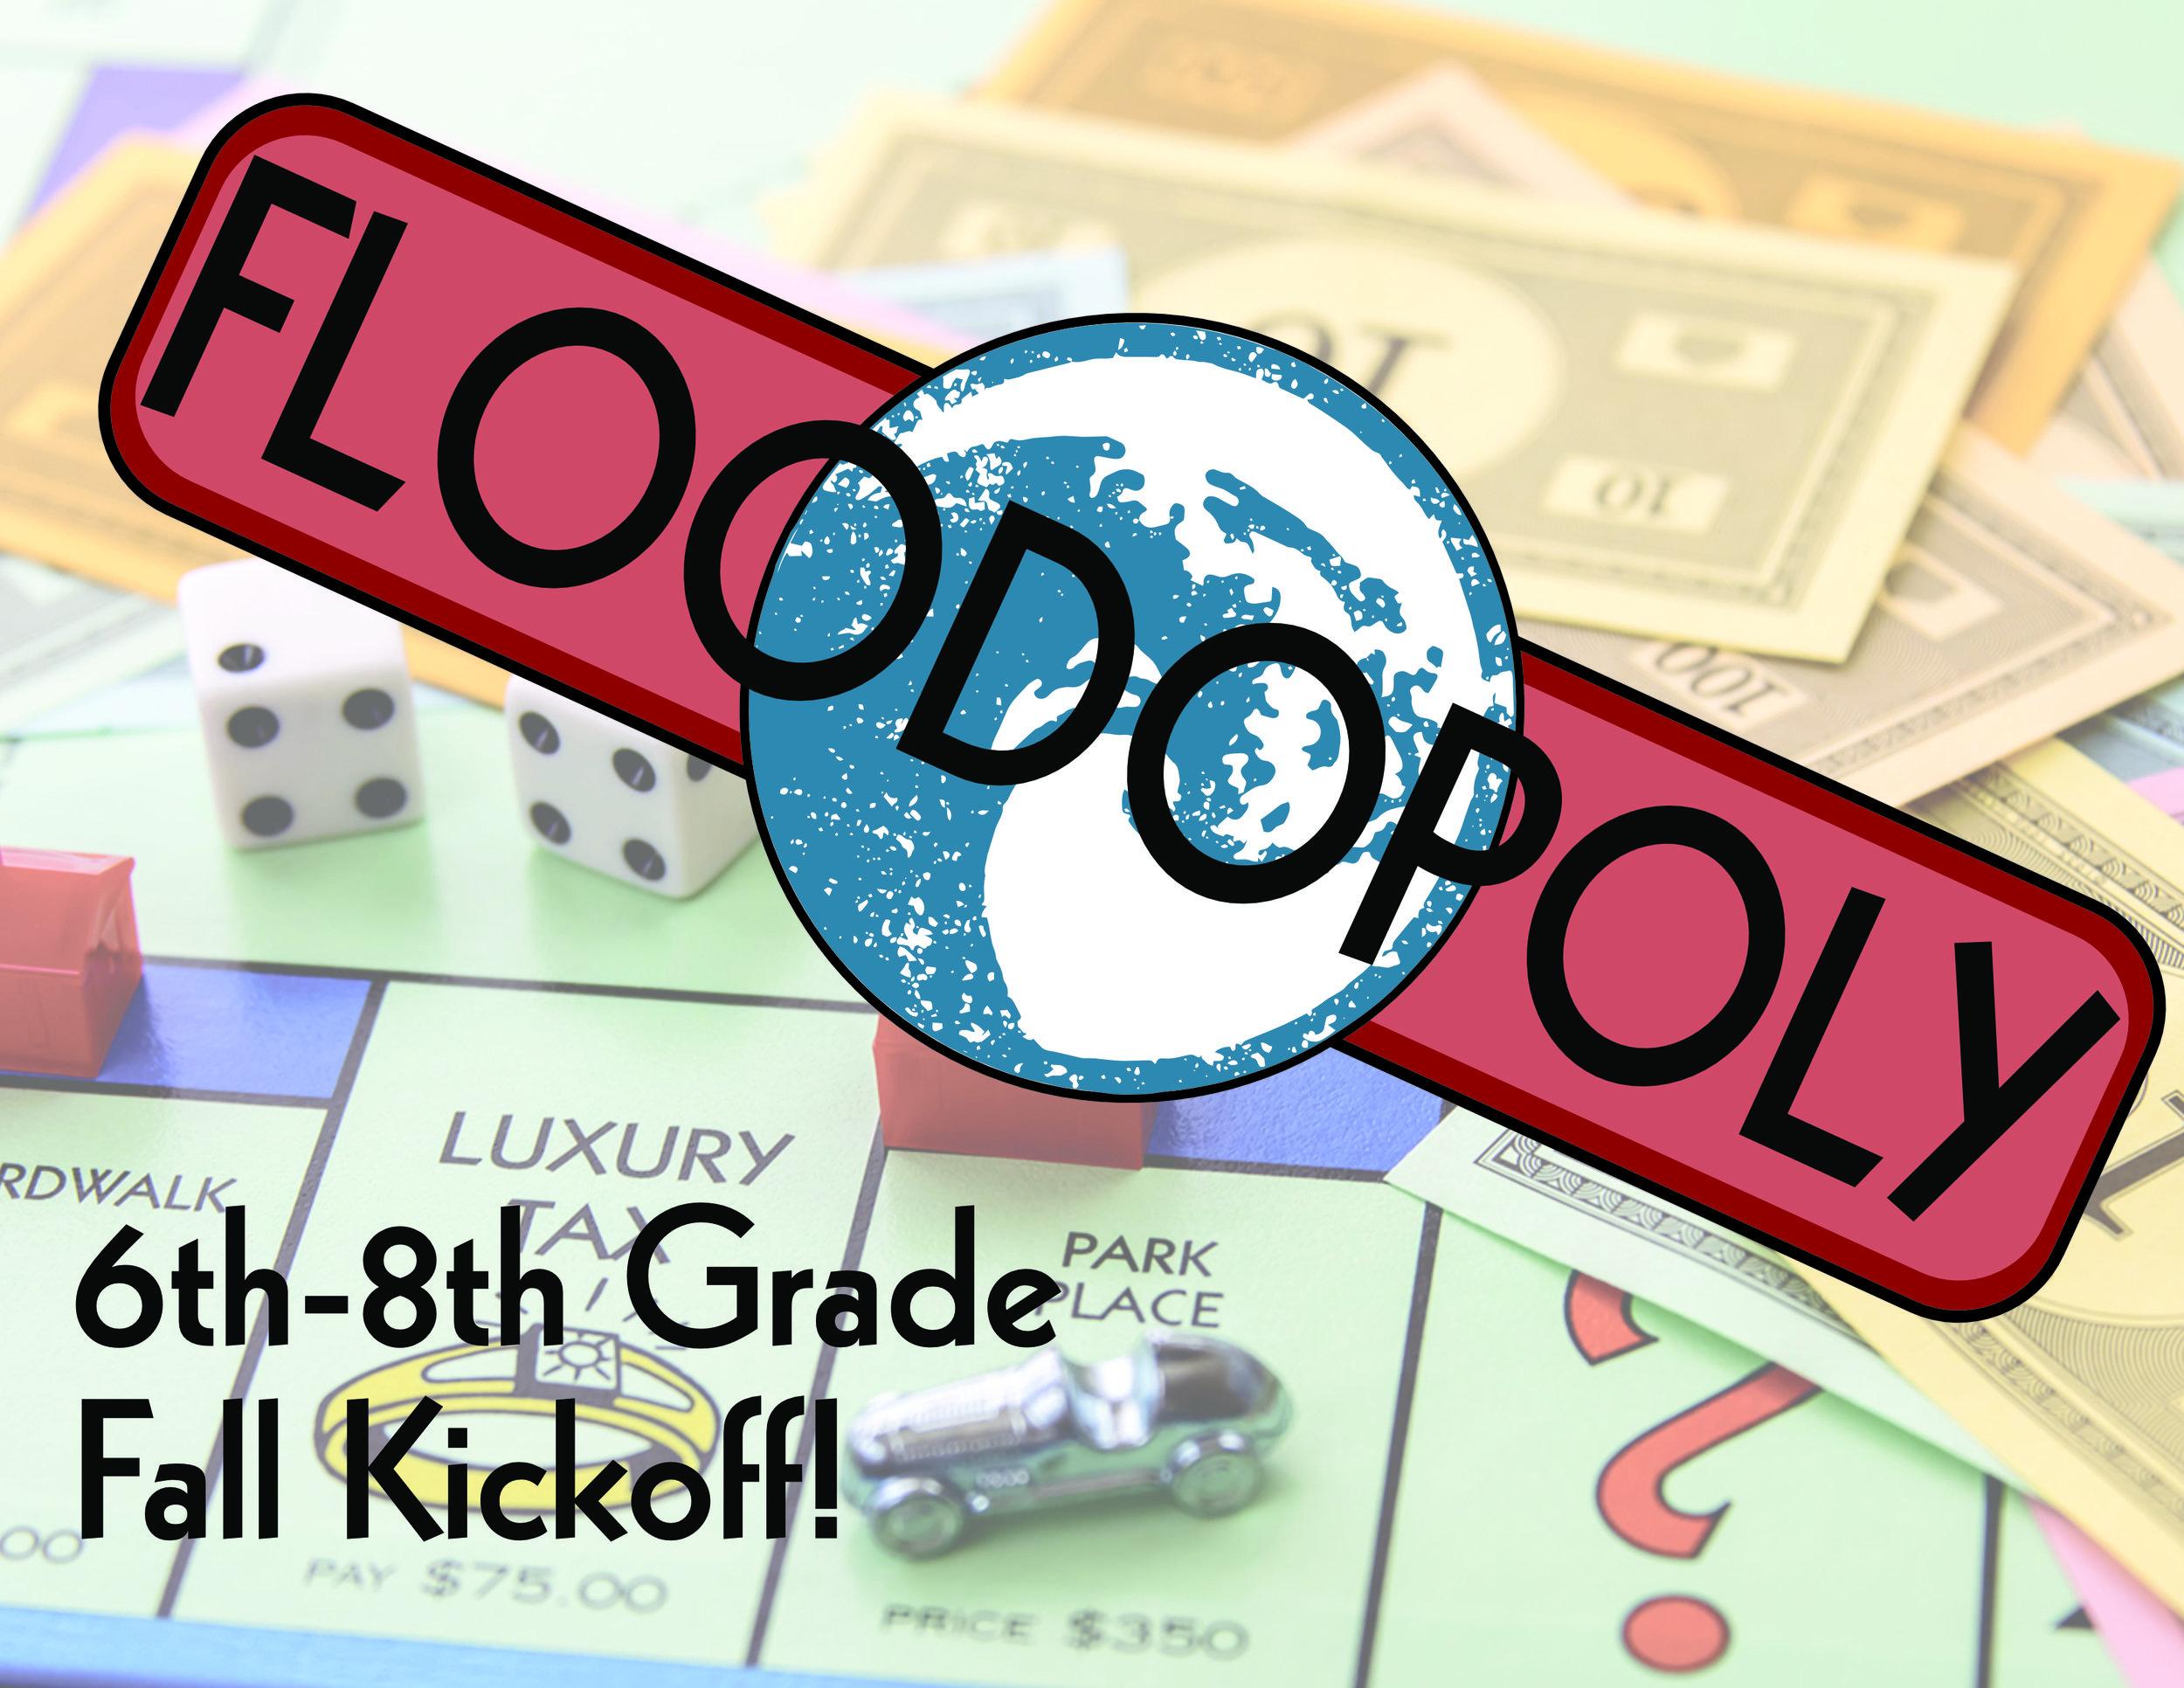 Floodopoly Kickoff Logos.jpg